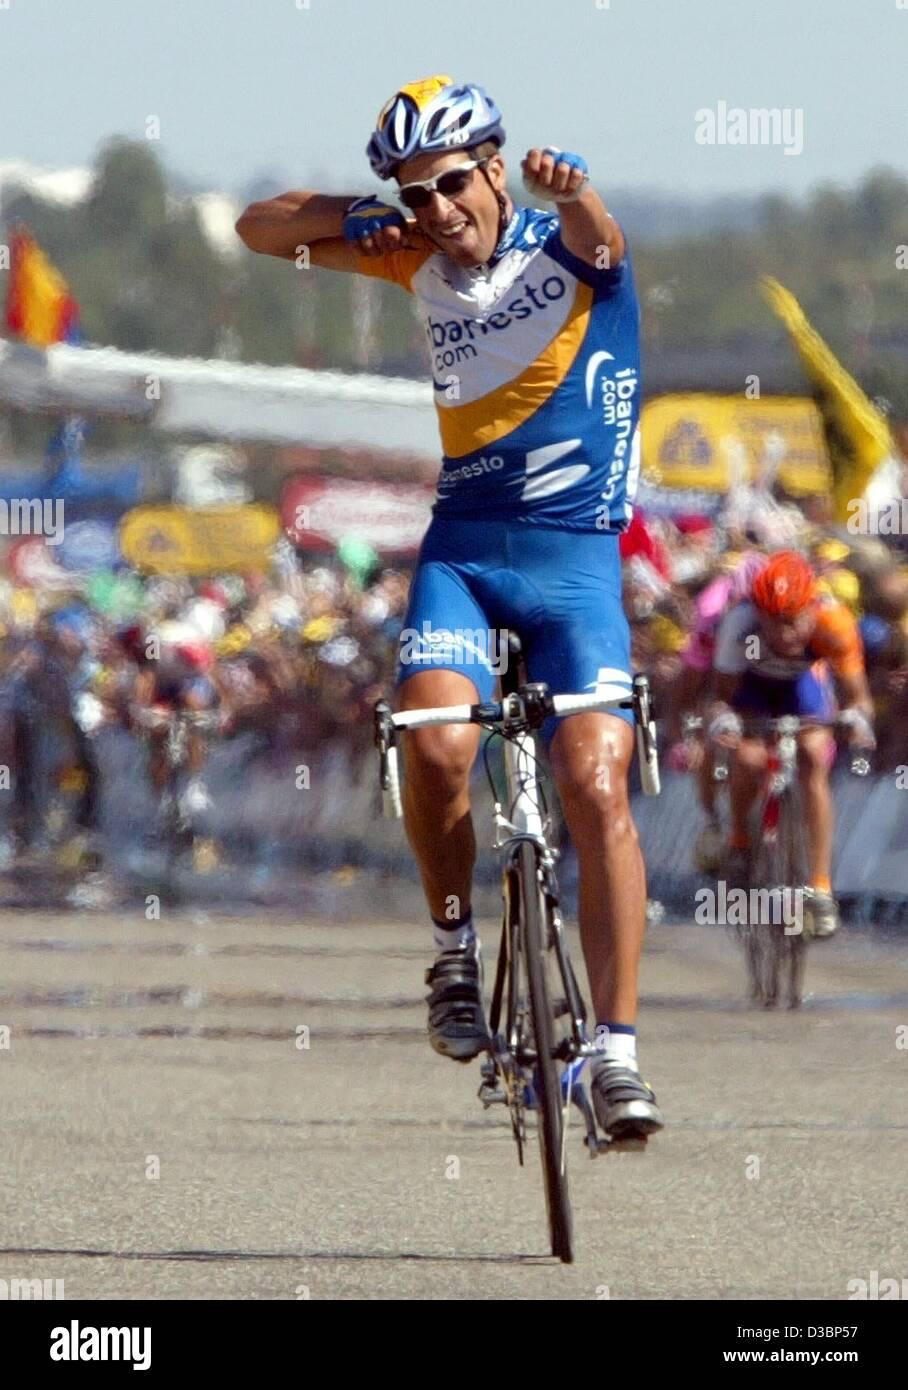 (dpa) - Spanish cyclist Juan Antonio Flecha (Team iBanesto) cheers after winning the 11th leg of the Tour de France Stock Photo